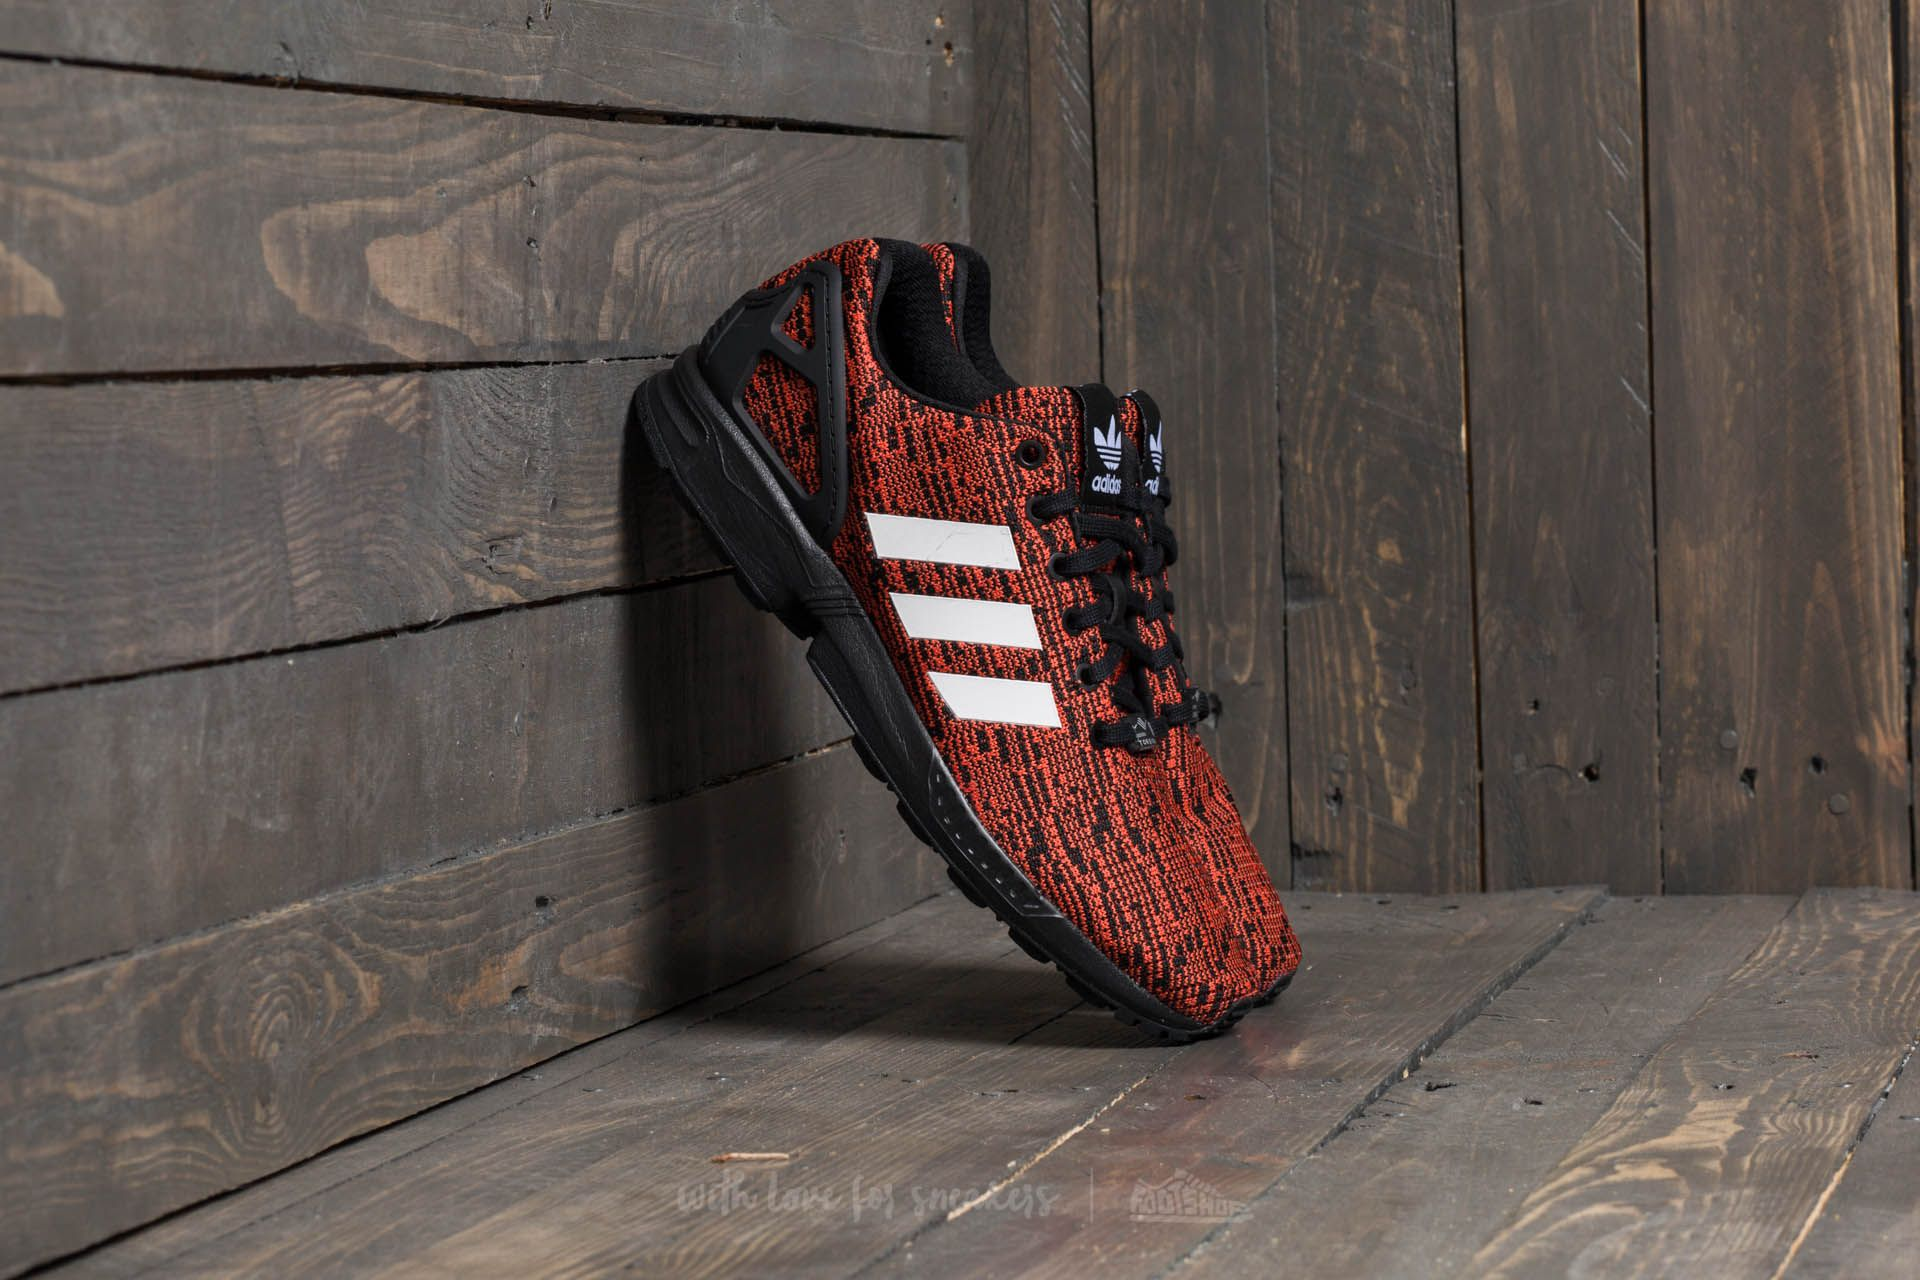 separation shoes 8bb23 40ac0 adidas ZX Flux Core Black/ Footwear White/ Red | Footshop